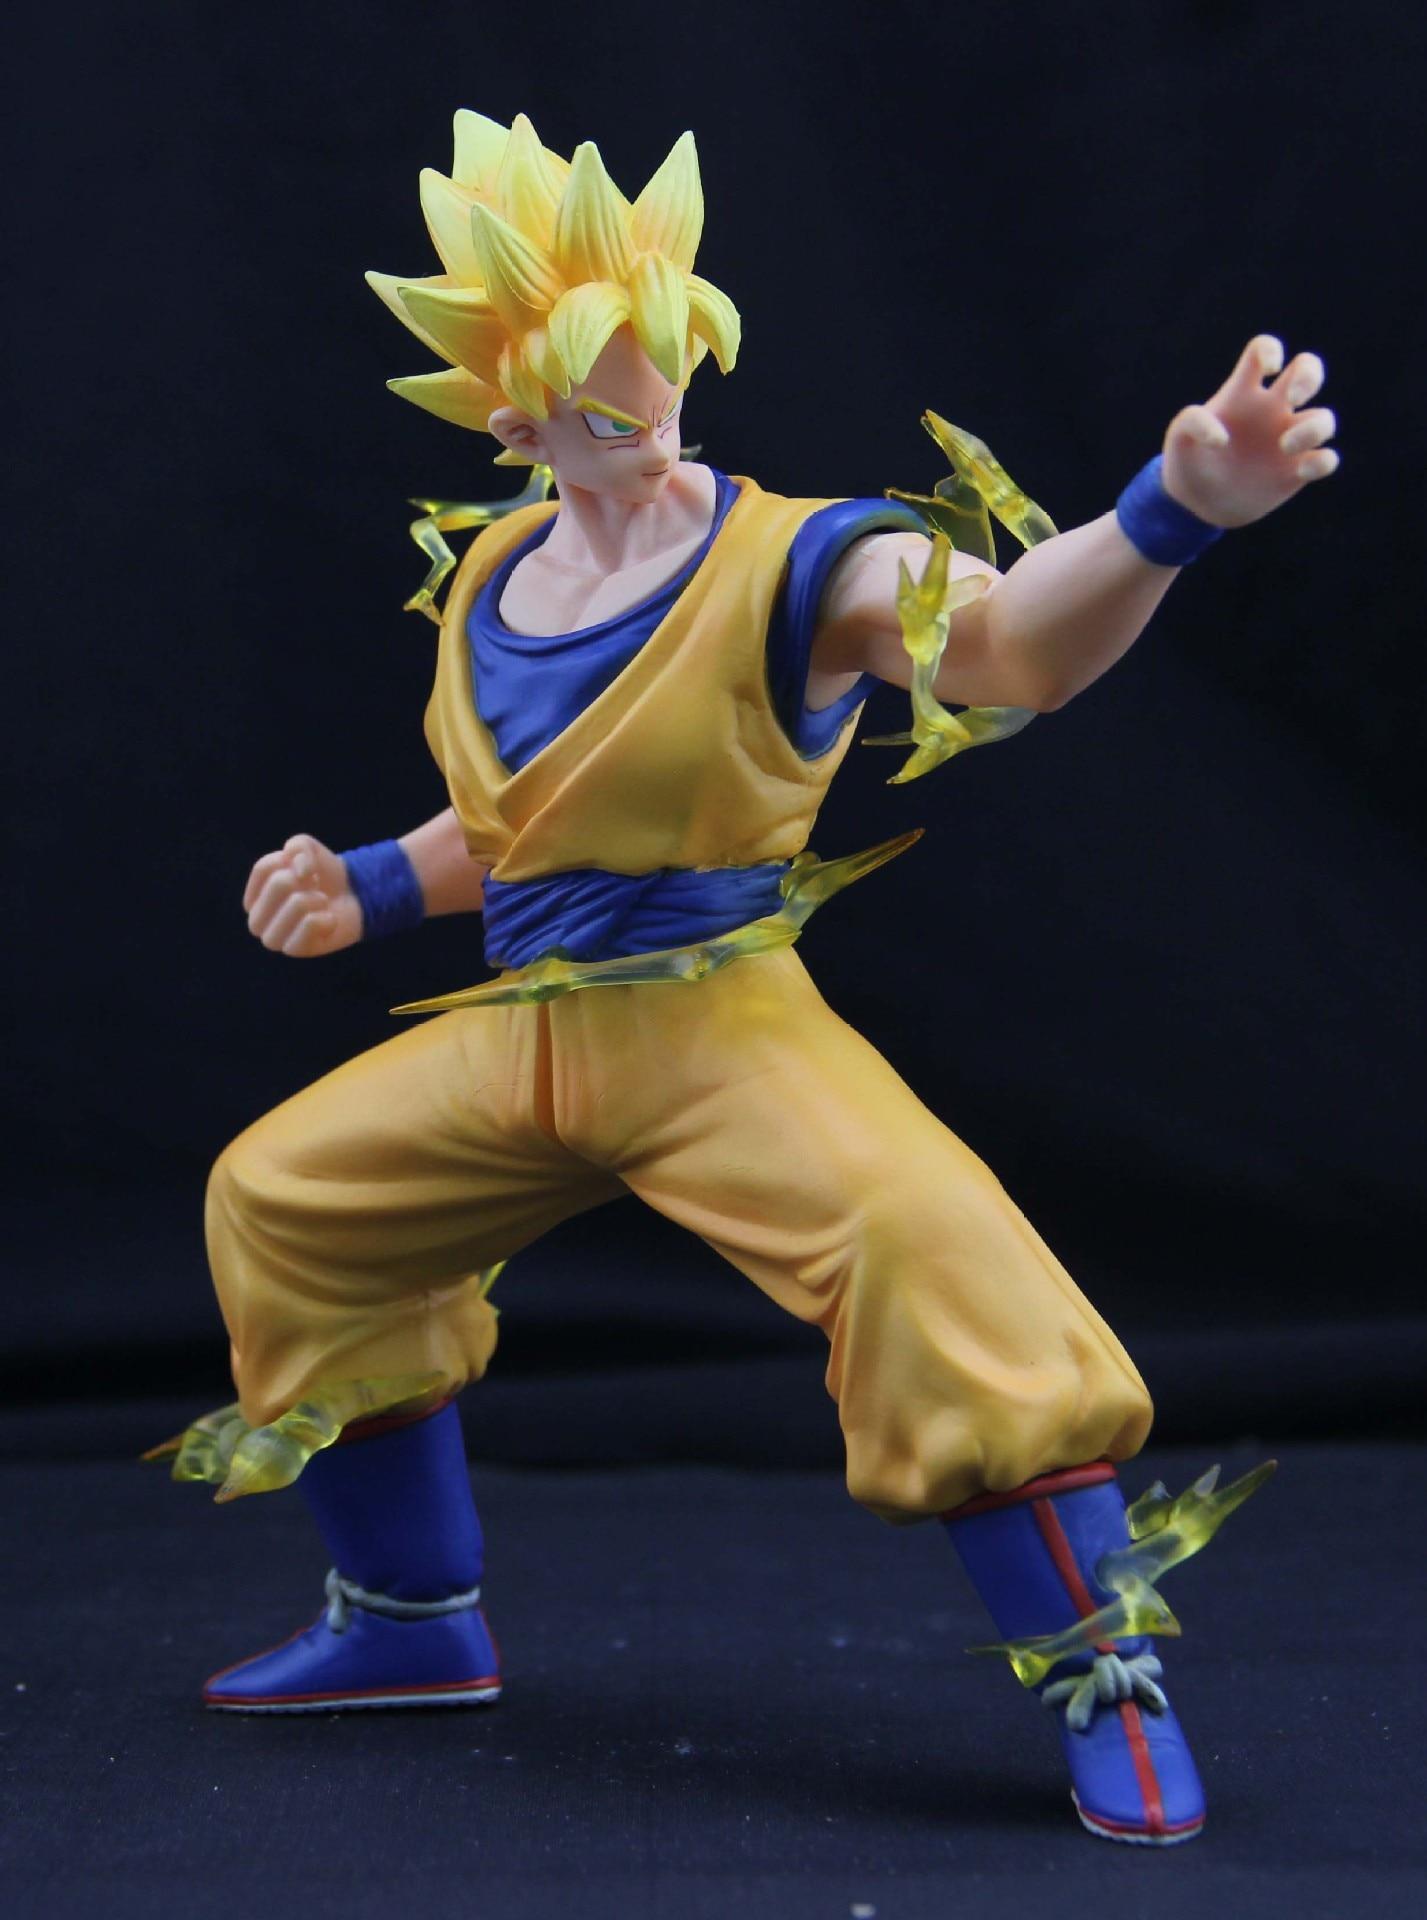 Anime Dragon Ball Z Son Goku 1/8 scale Second Ver. Saiyan  PVC Action Figure collectible Model Toys 17cm  KT1335<br><br>Aliexpress